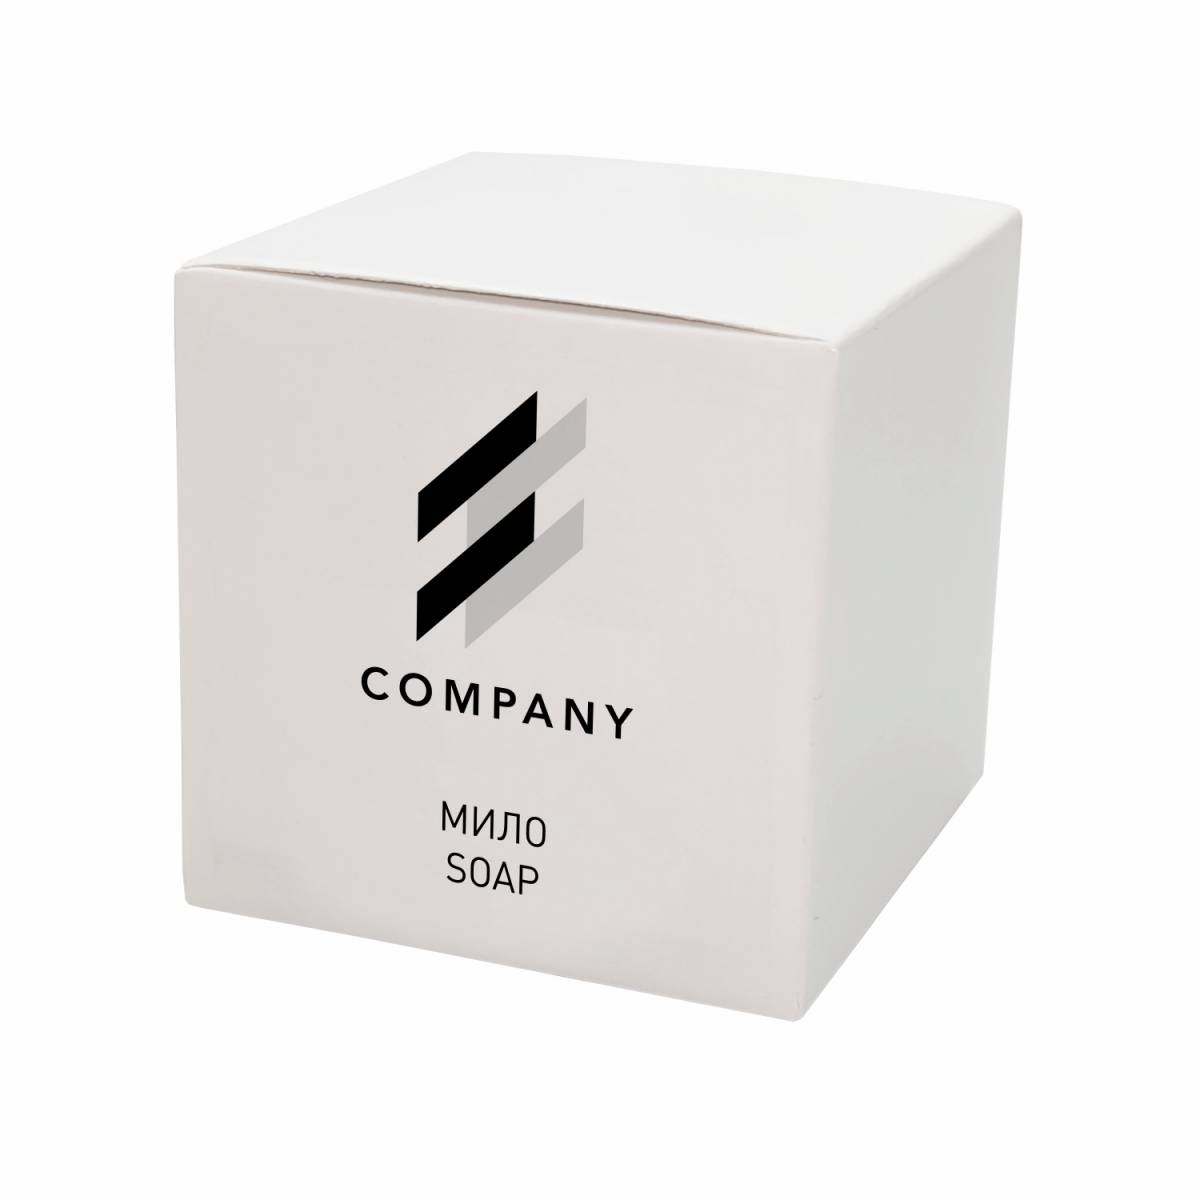 Мило 15 гр в коробочке с логотипом заказчика SO15-3L HSG